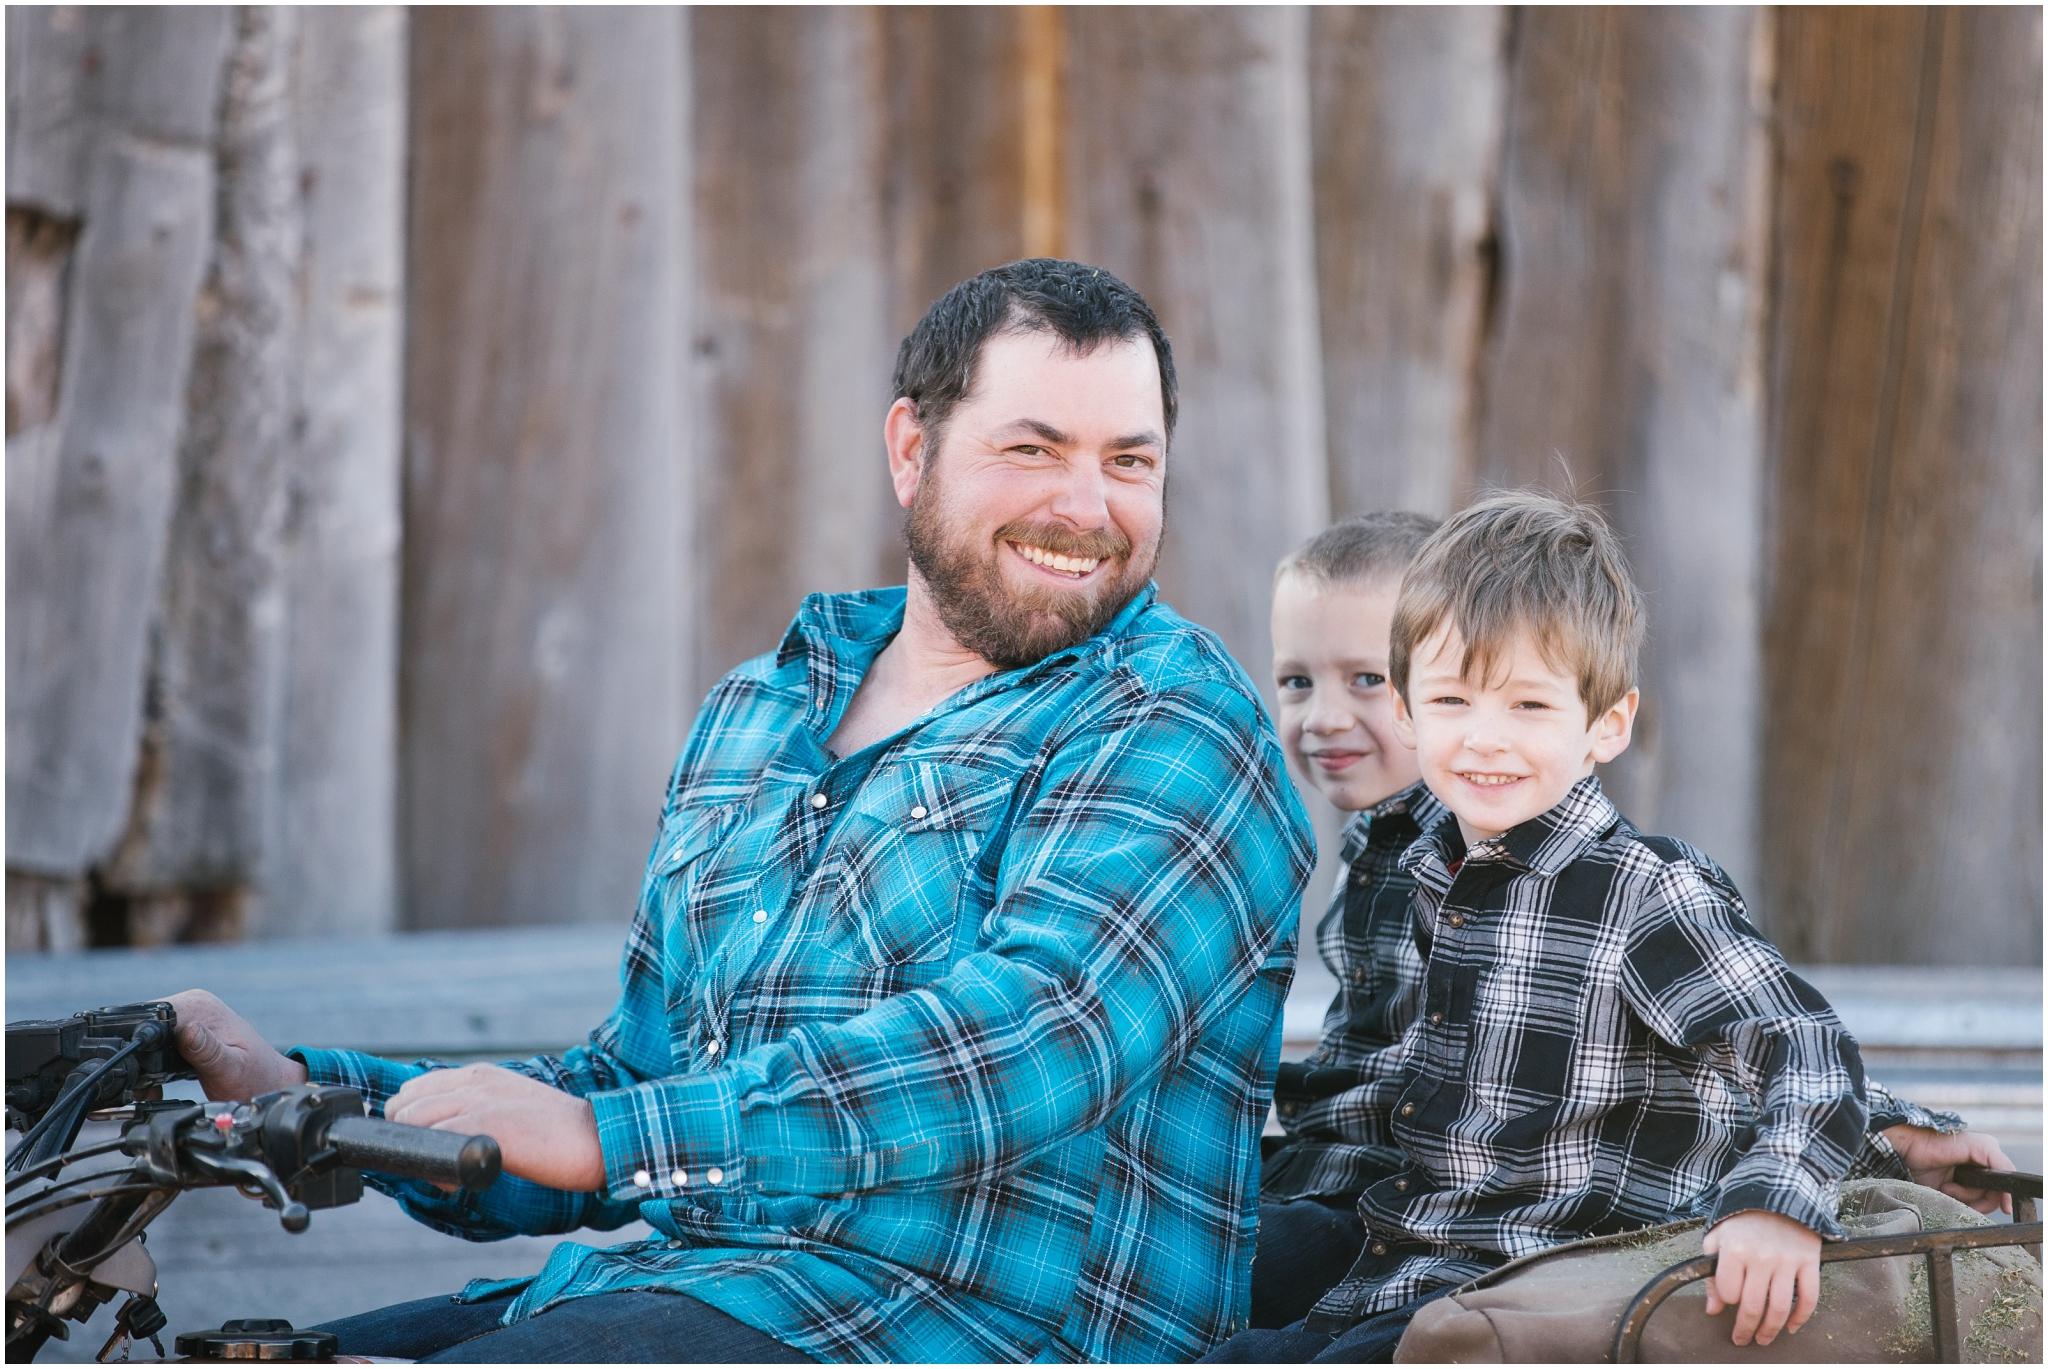 Conrad-48_Lizzie-B-Imagery-Utah-Family-Photographer-Utah-County-Central-Utah-Park-City-Extended-Family-Session.jpg